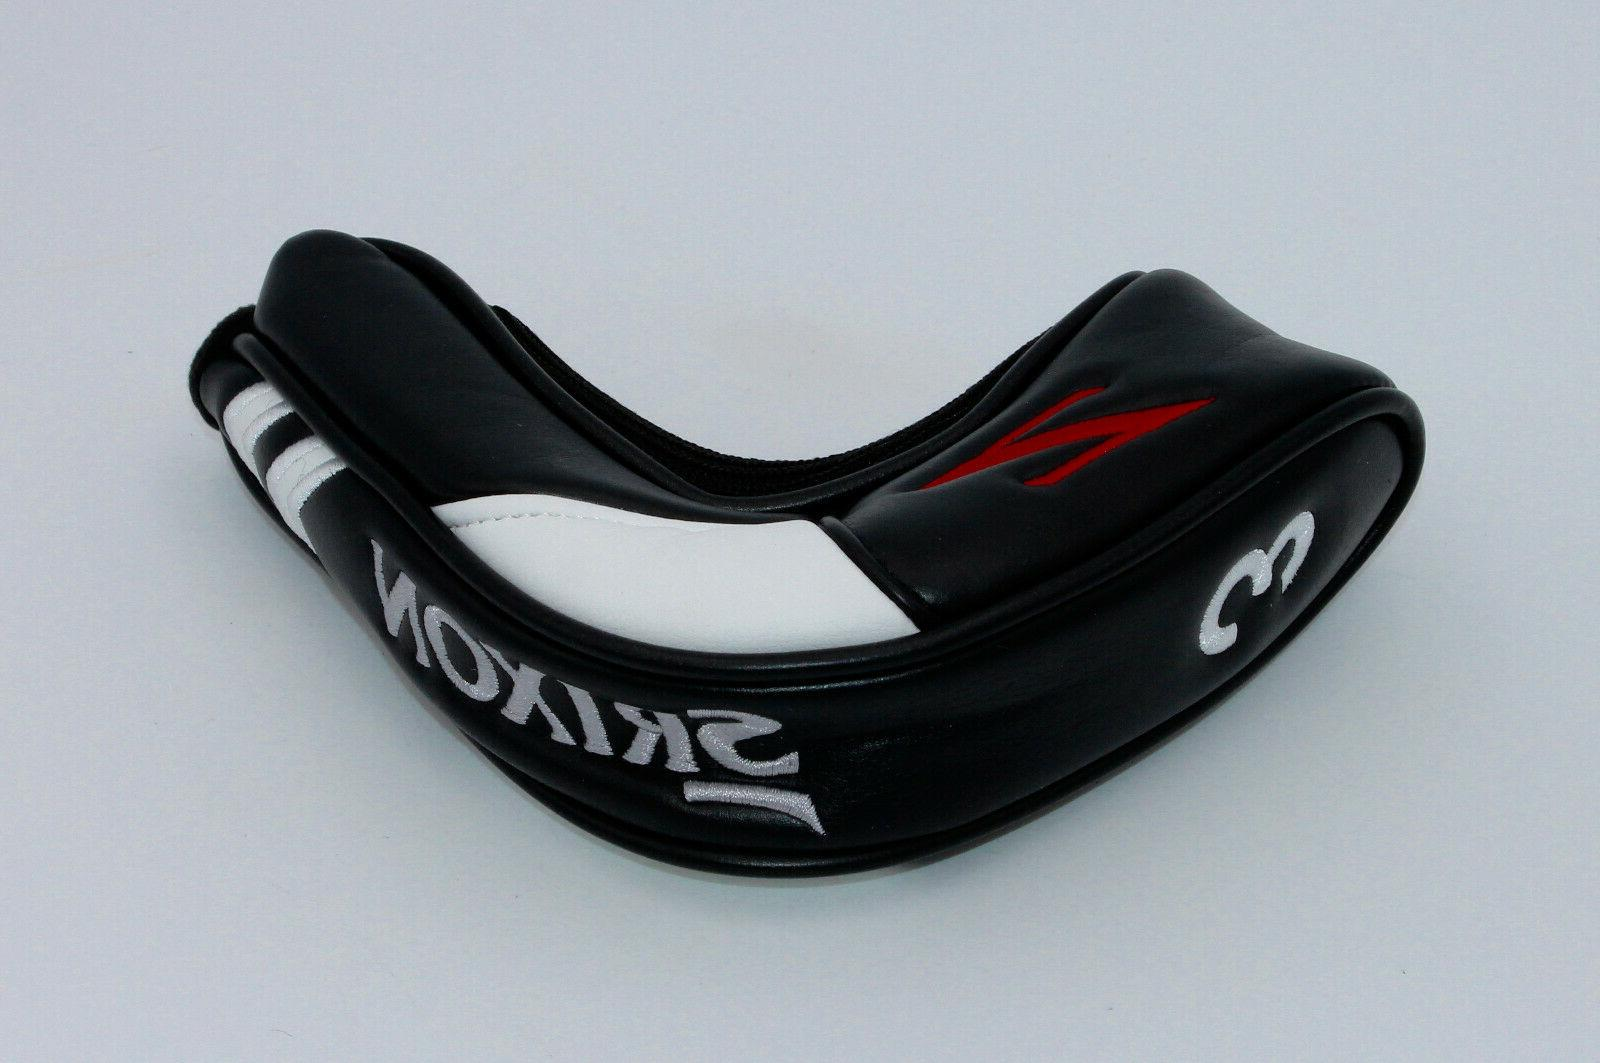 new z black white 3 hybrid iron